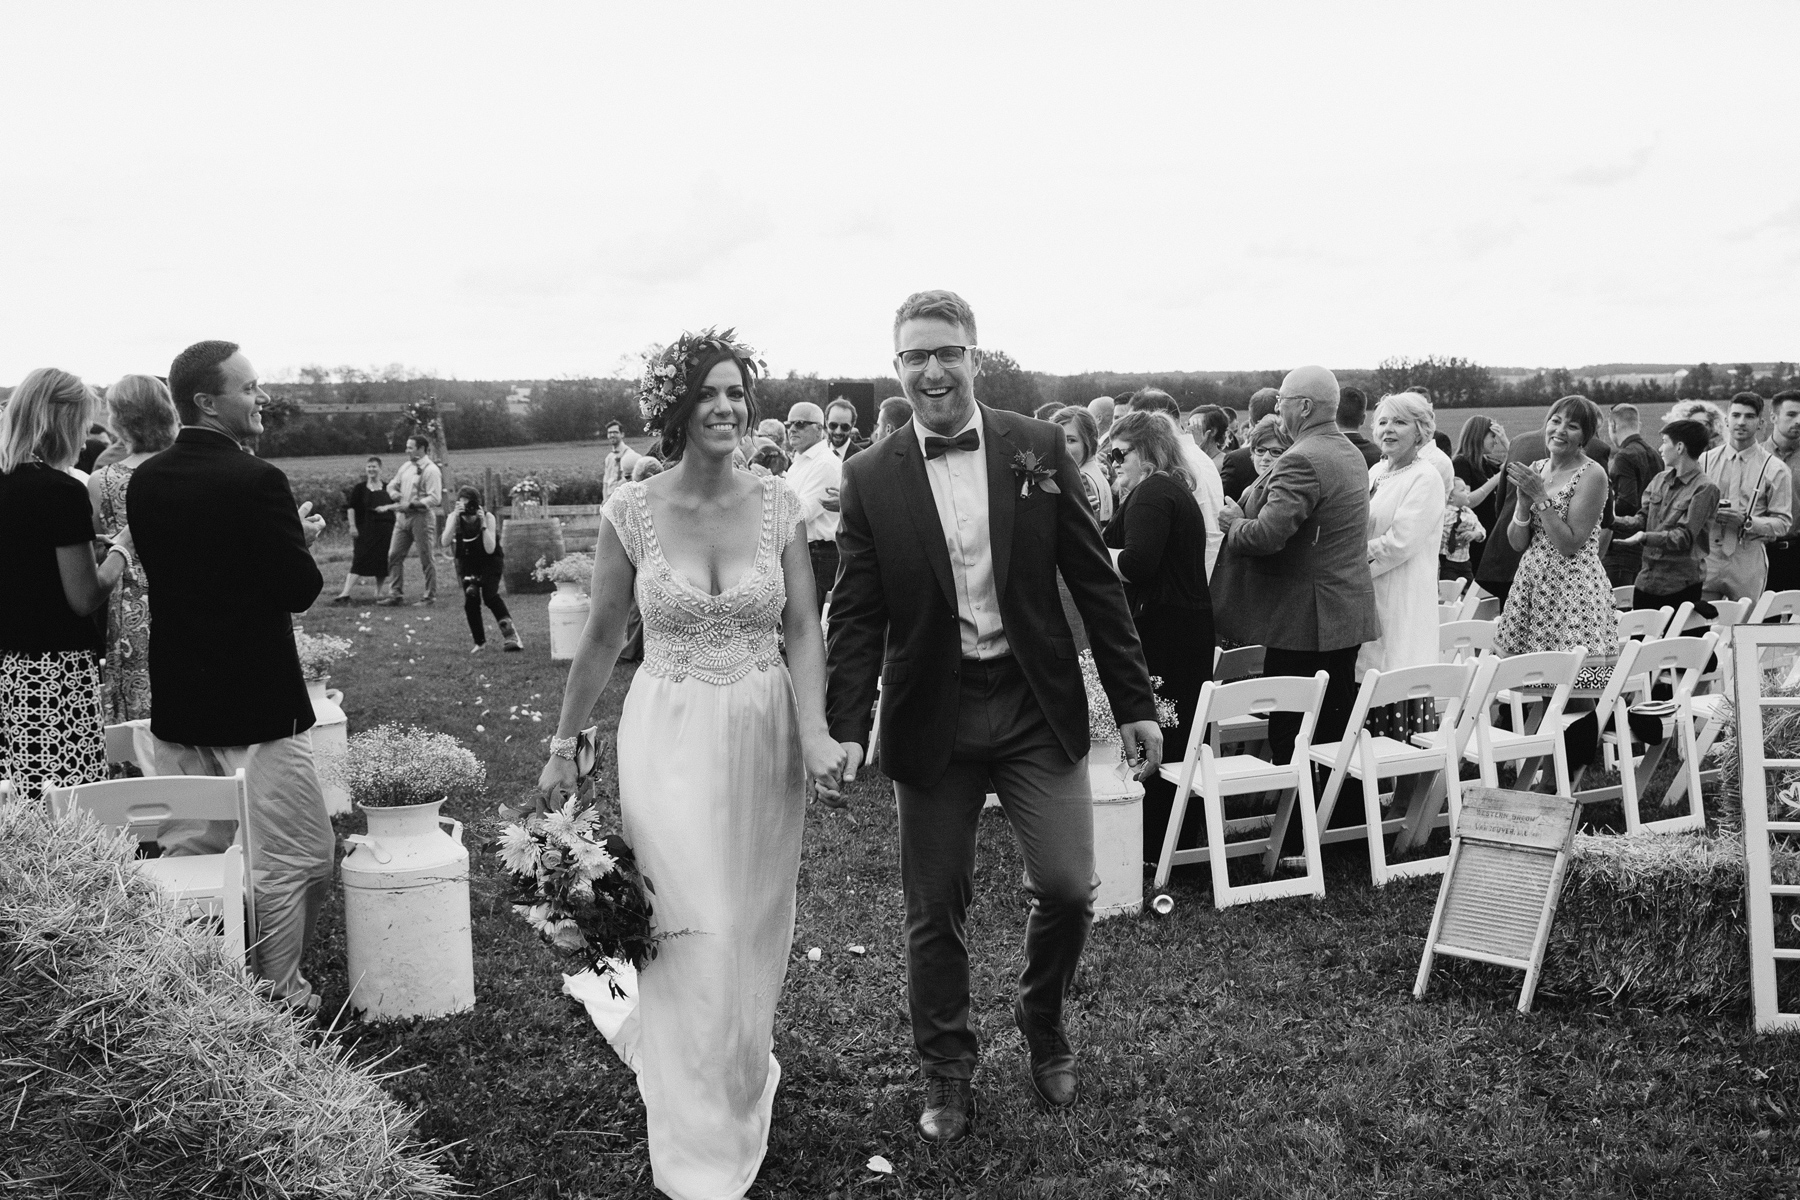 alberta-farm-wedding-photographer-rp-wj-148.jpg